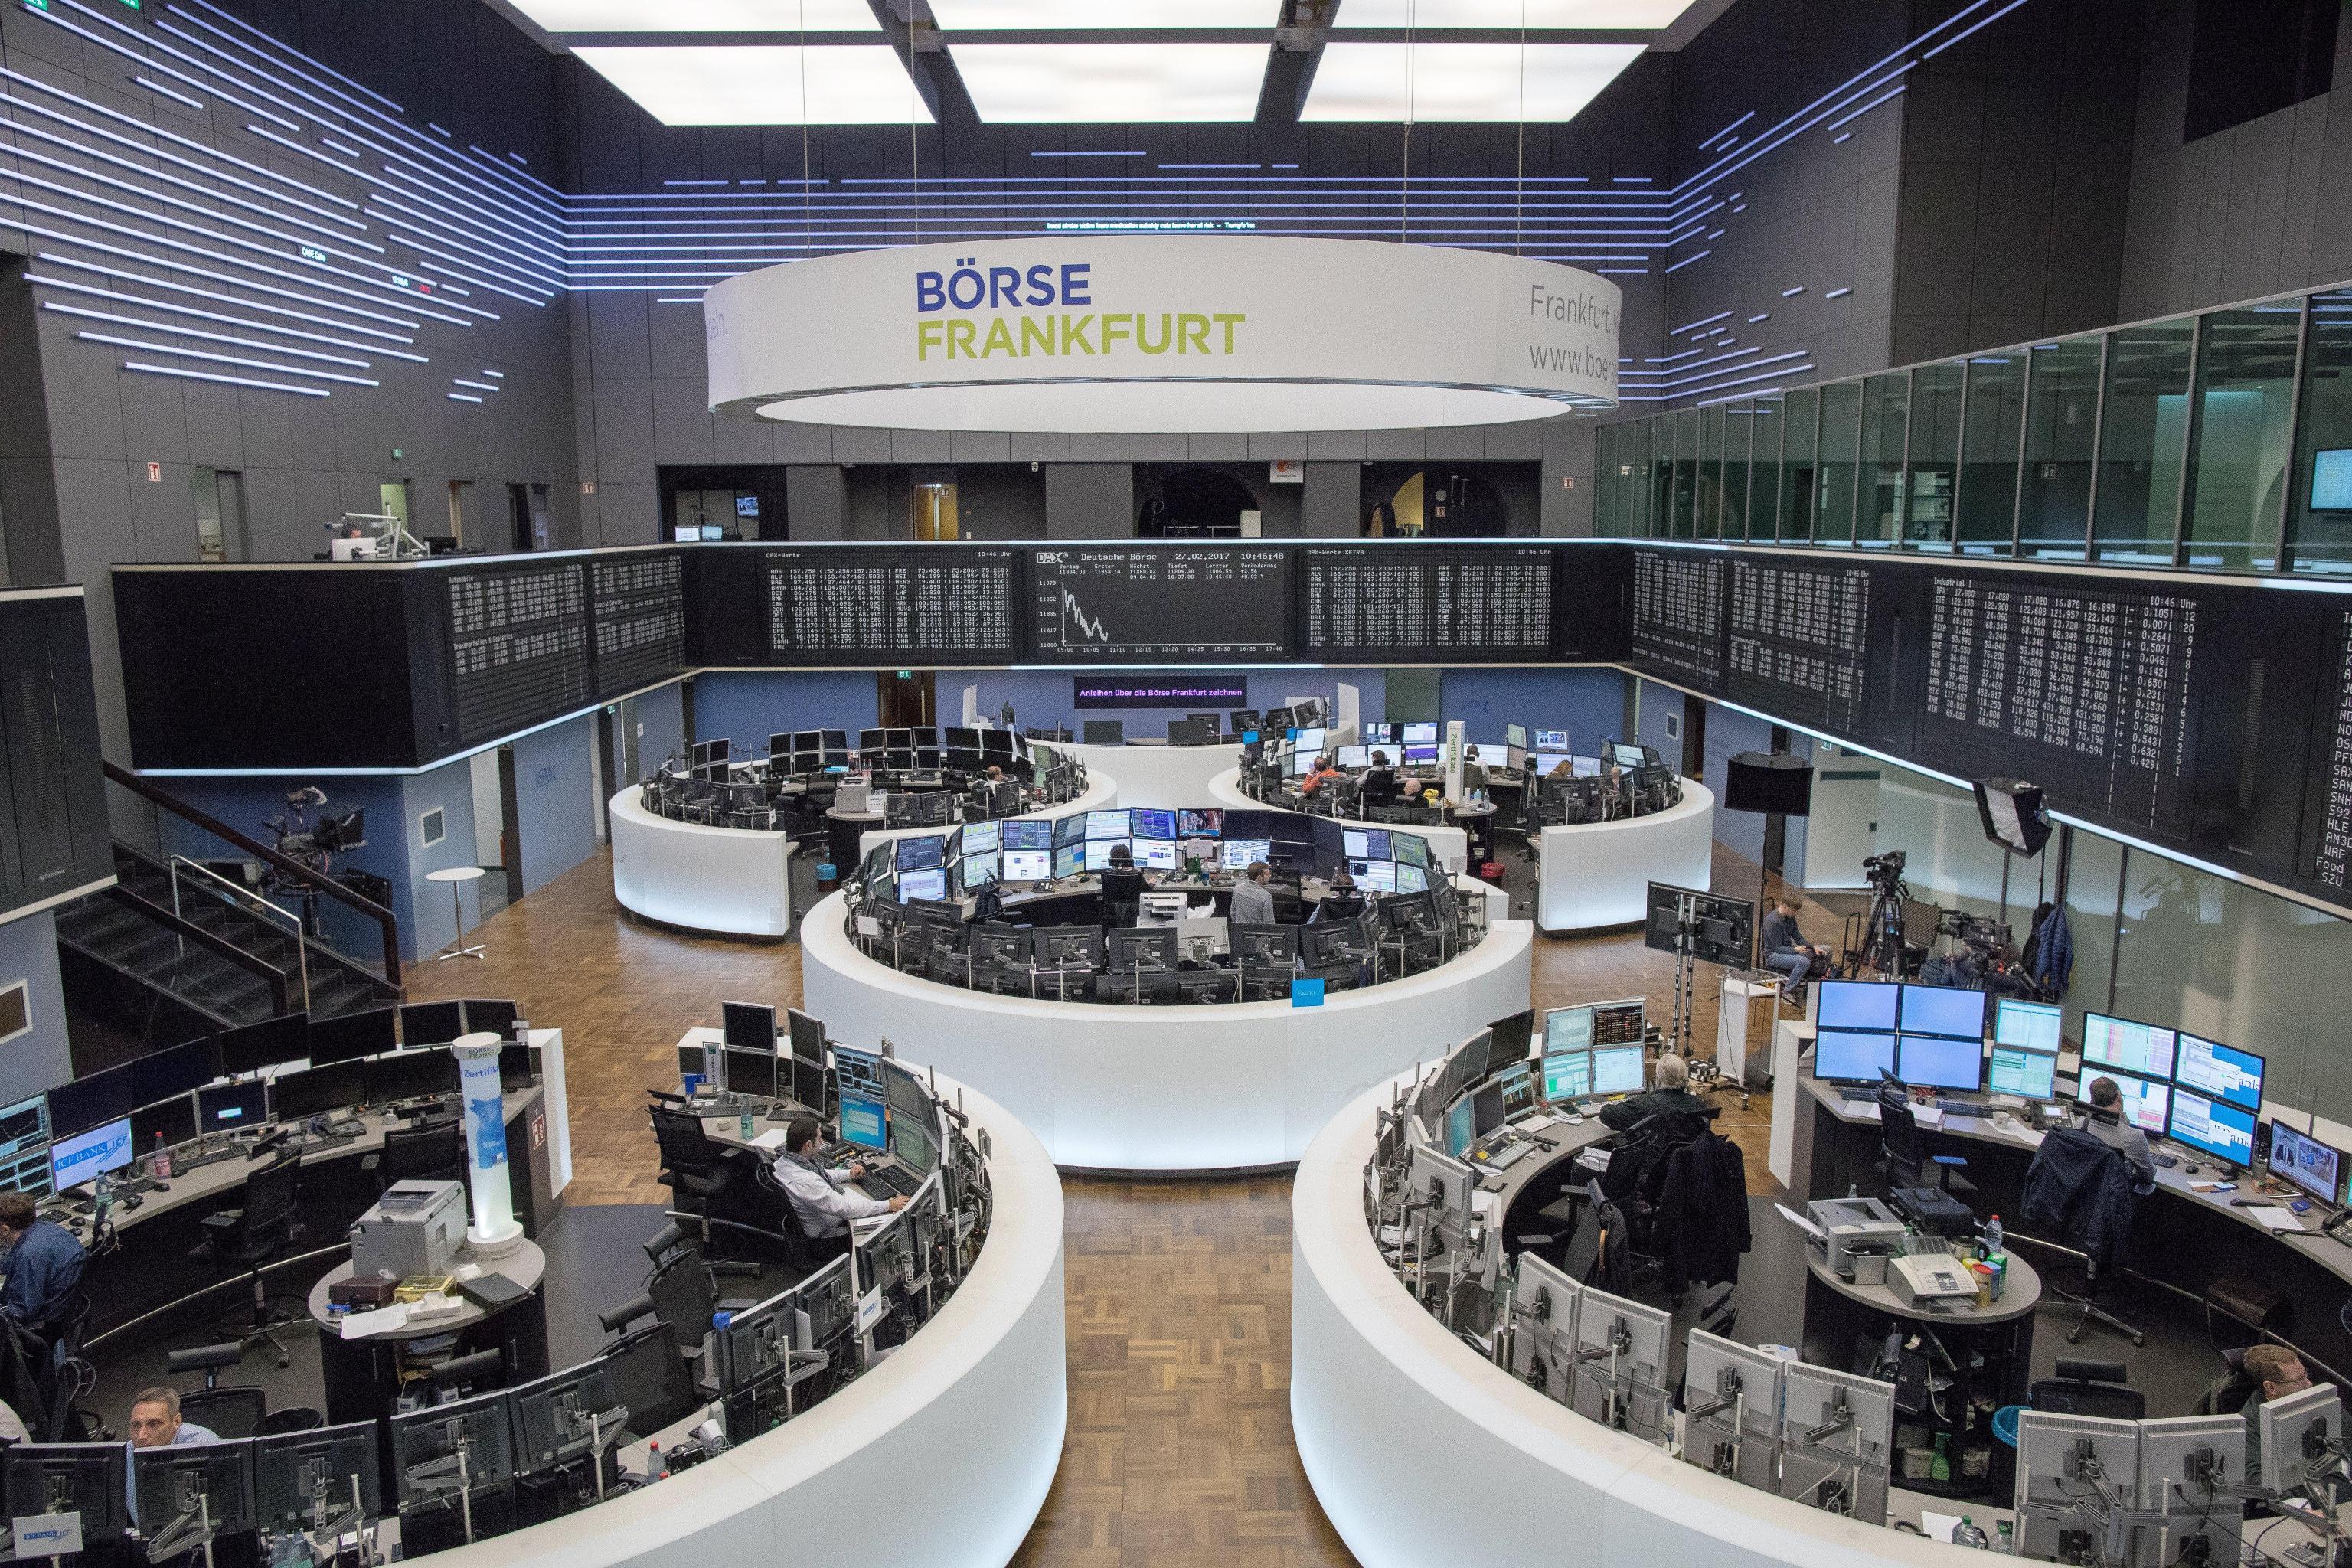 Borsa: Europa, Parigi +1,55% in chiusura